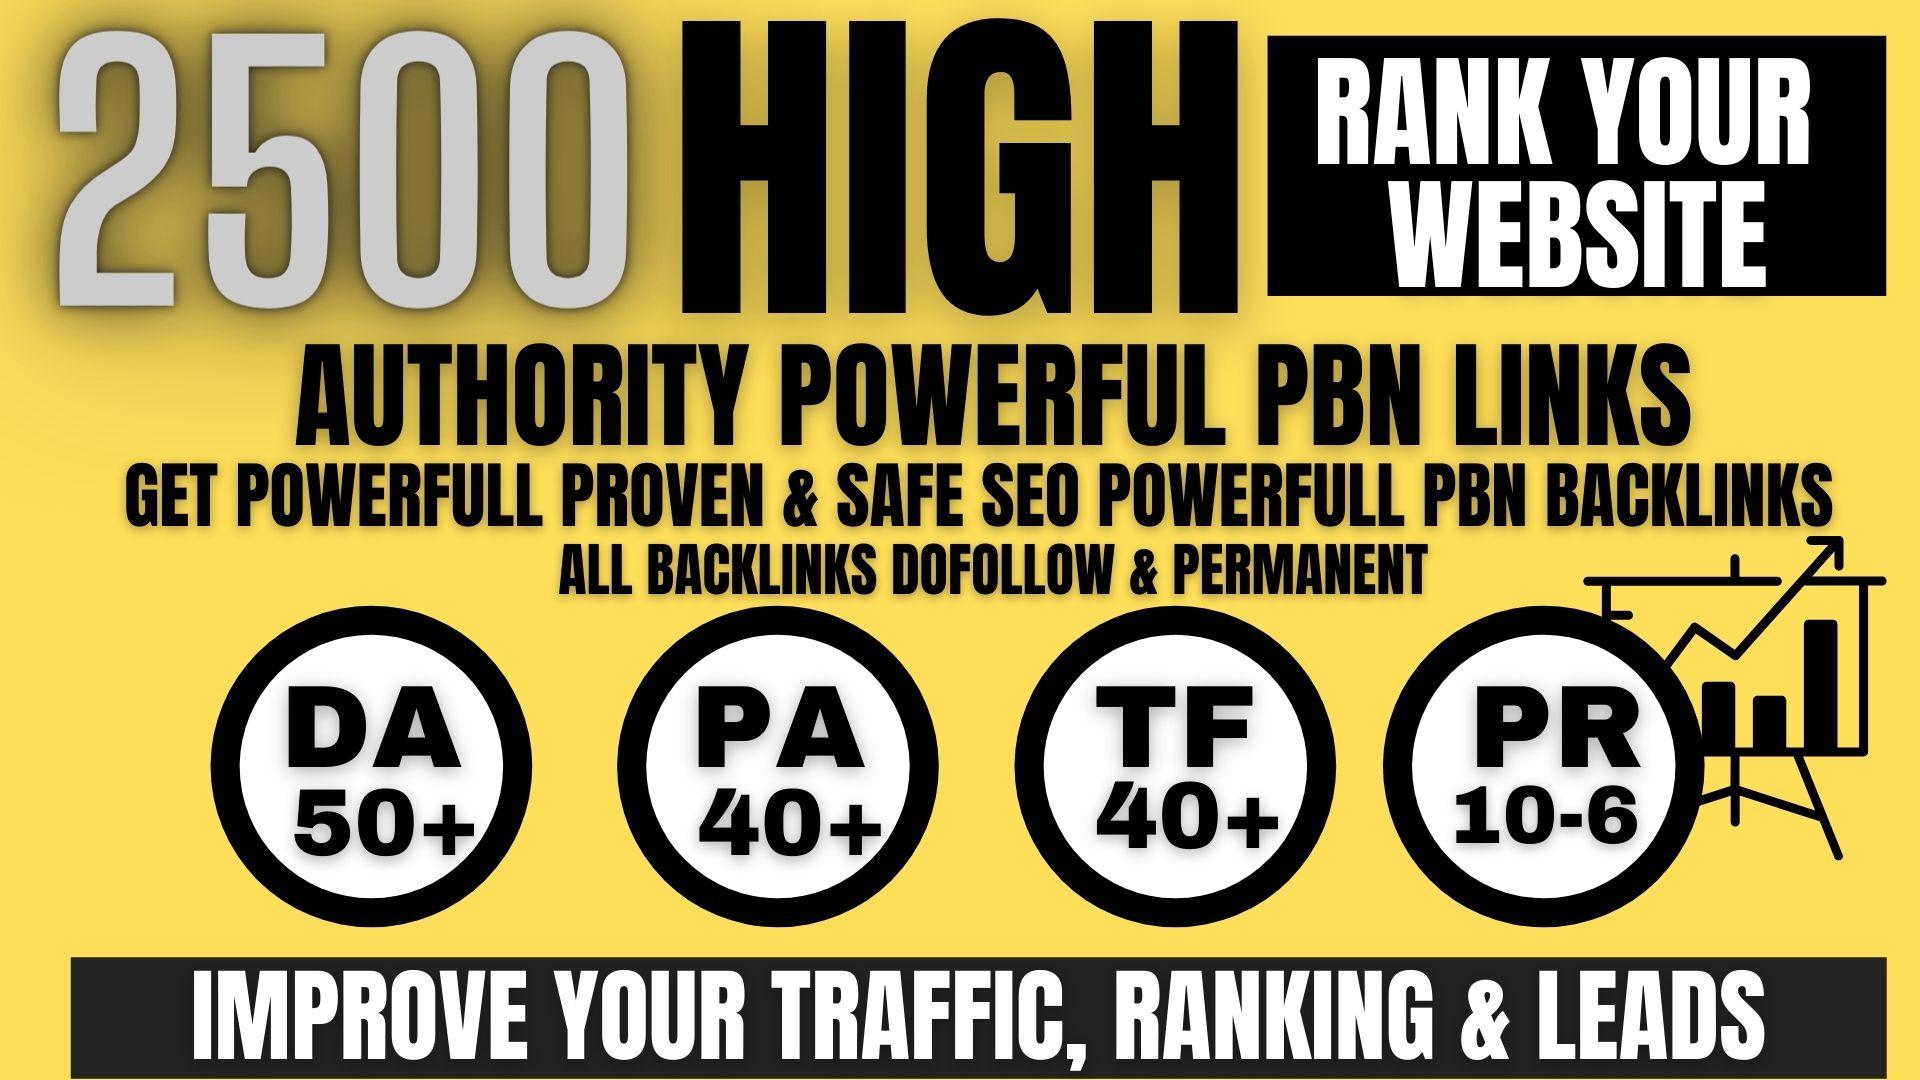 get permanent 2500 Pbn Backlink DA50+PA40+PR6+homepage web 2.0 with do-follow unique site